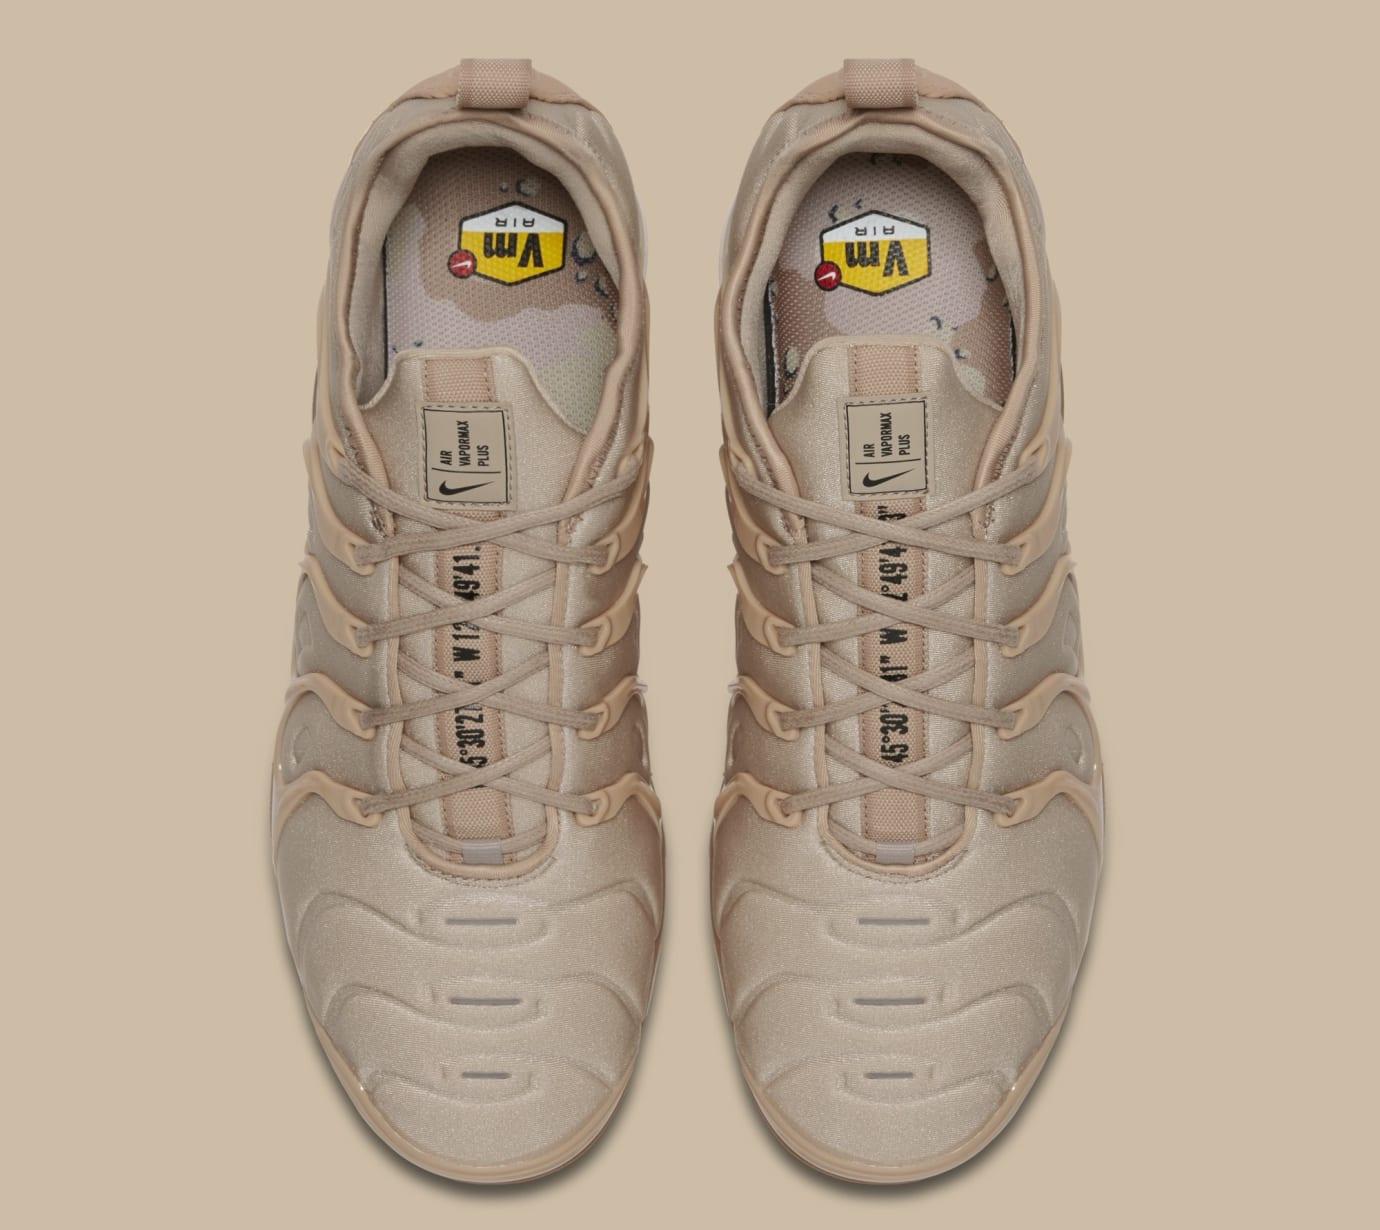 Nike VaporMax Plus 'String/Black/Desert/Gum Light Brown' AT5681-200 (Top)